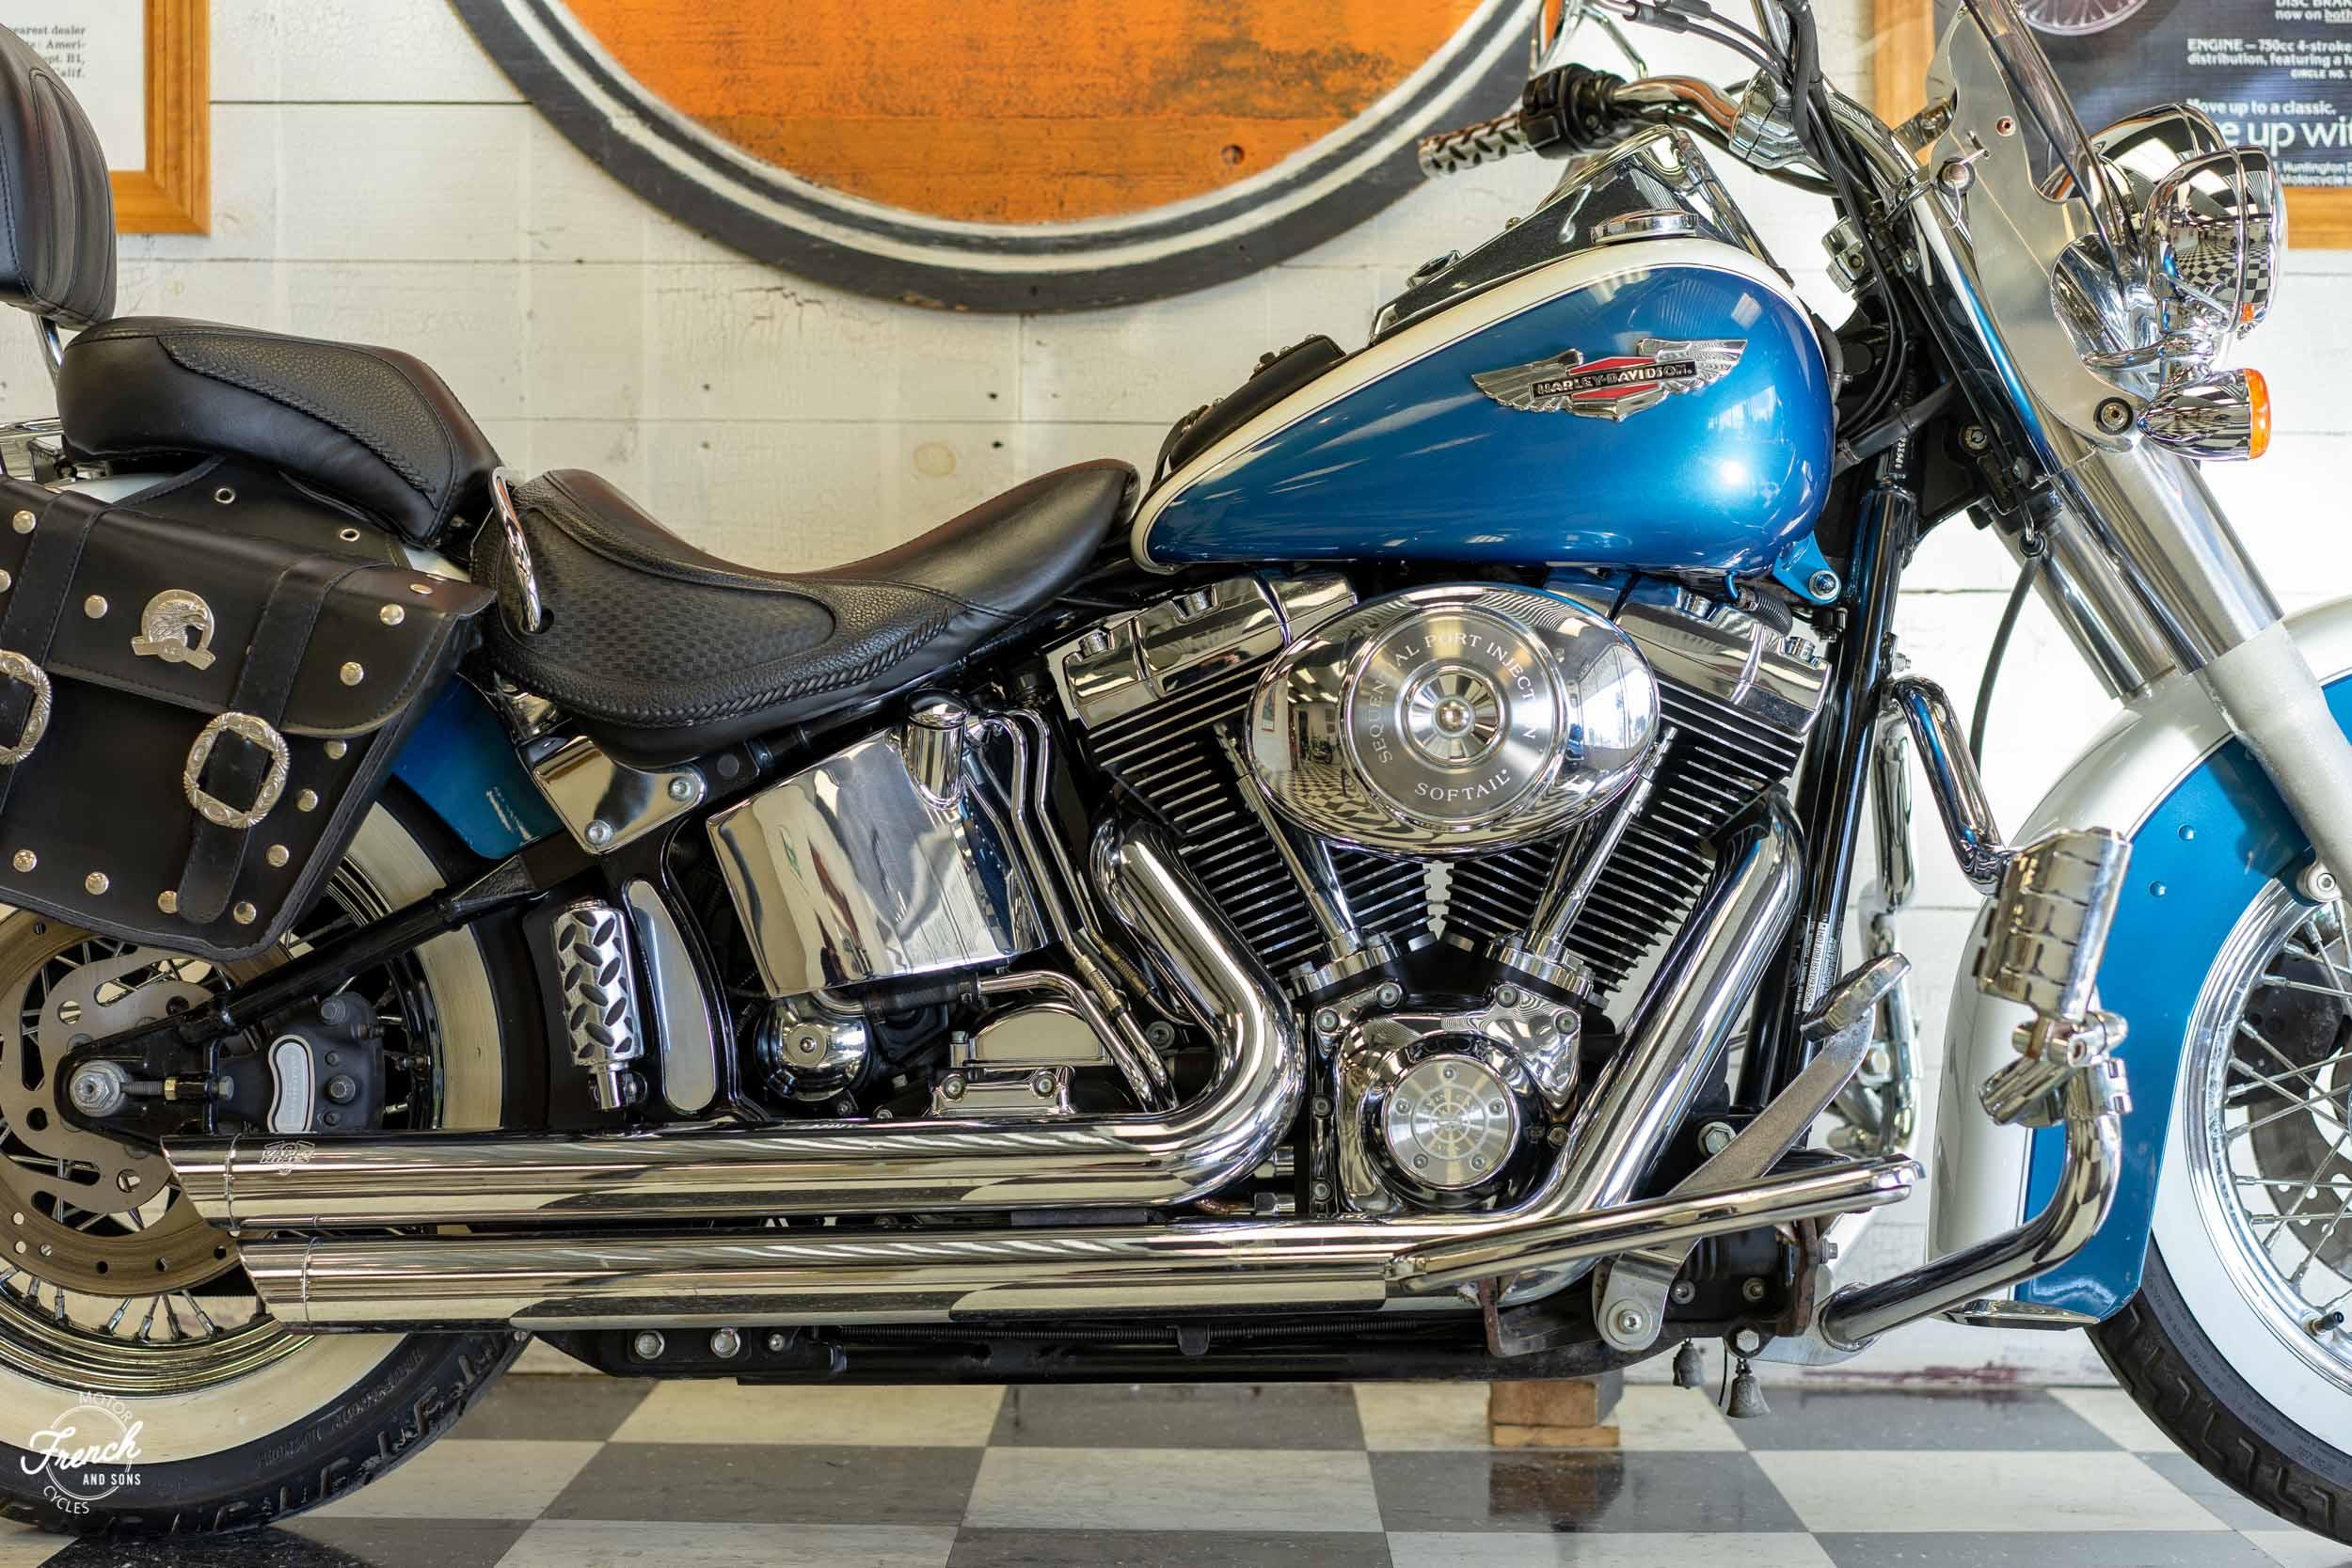 2005_Harley_Davidson_Softail_Deluxe-4.jpg